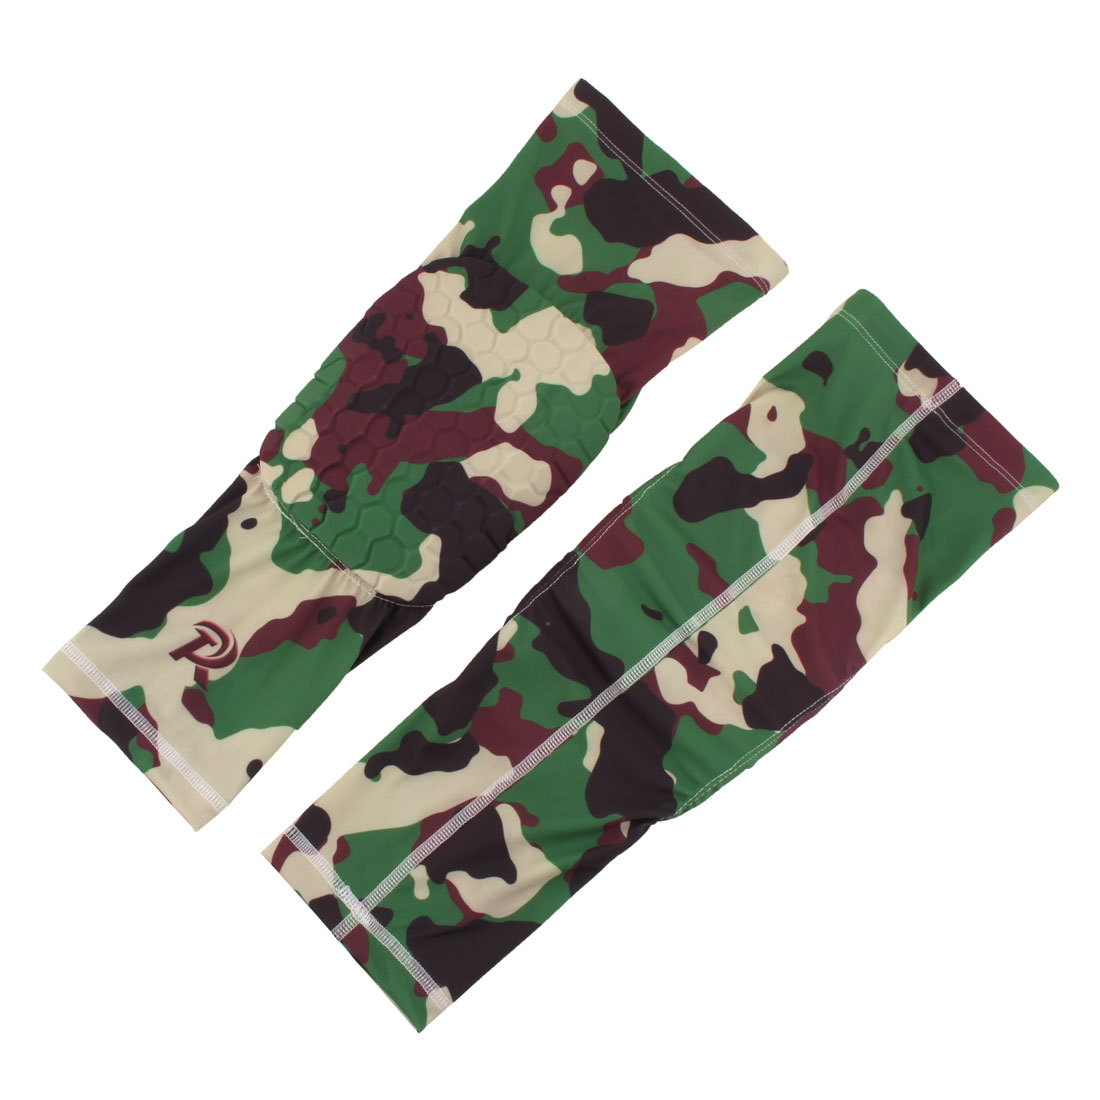 Basketball Patella Knee Brace Leg Sleeve Wrap Support Camouflage Green XL Pair - image 6 de 6